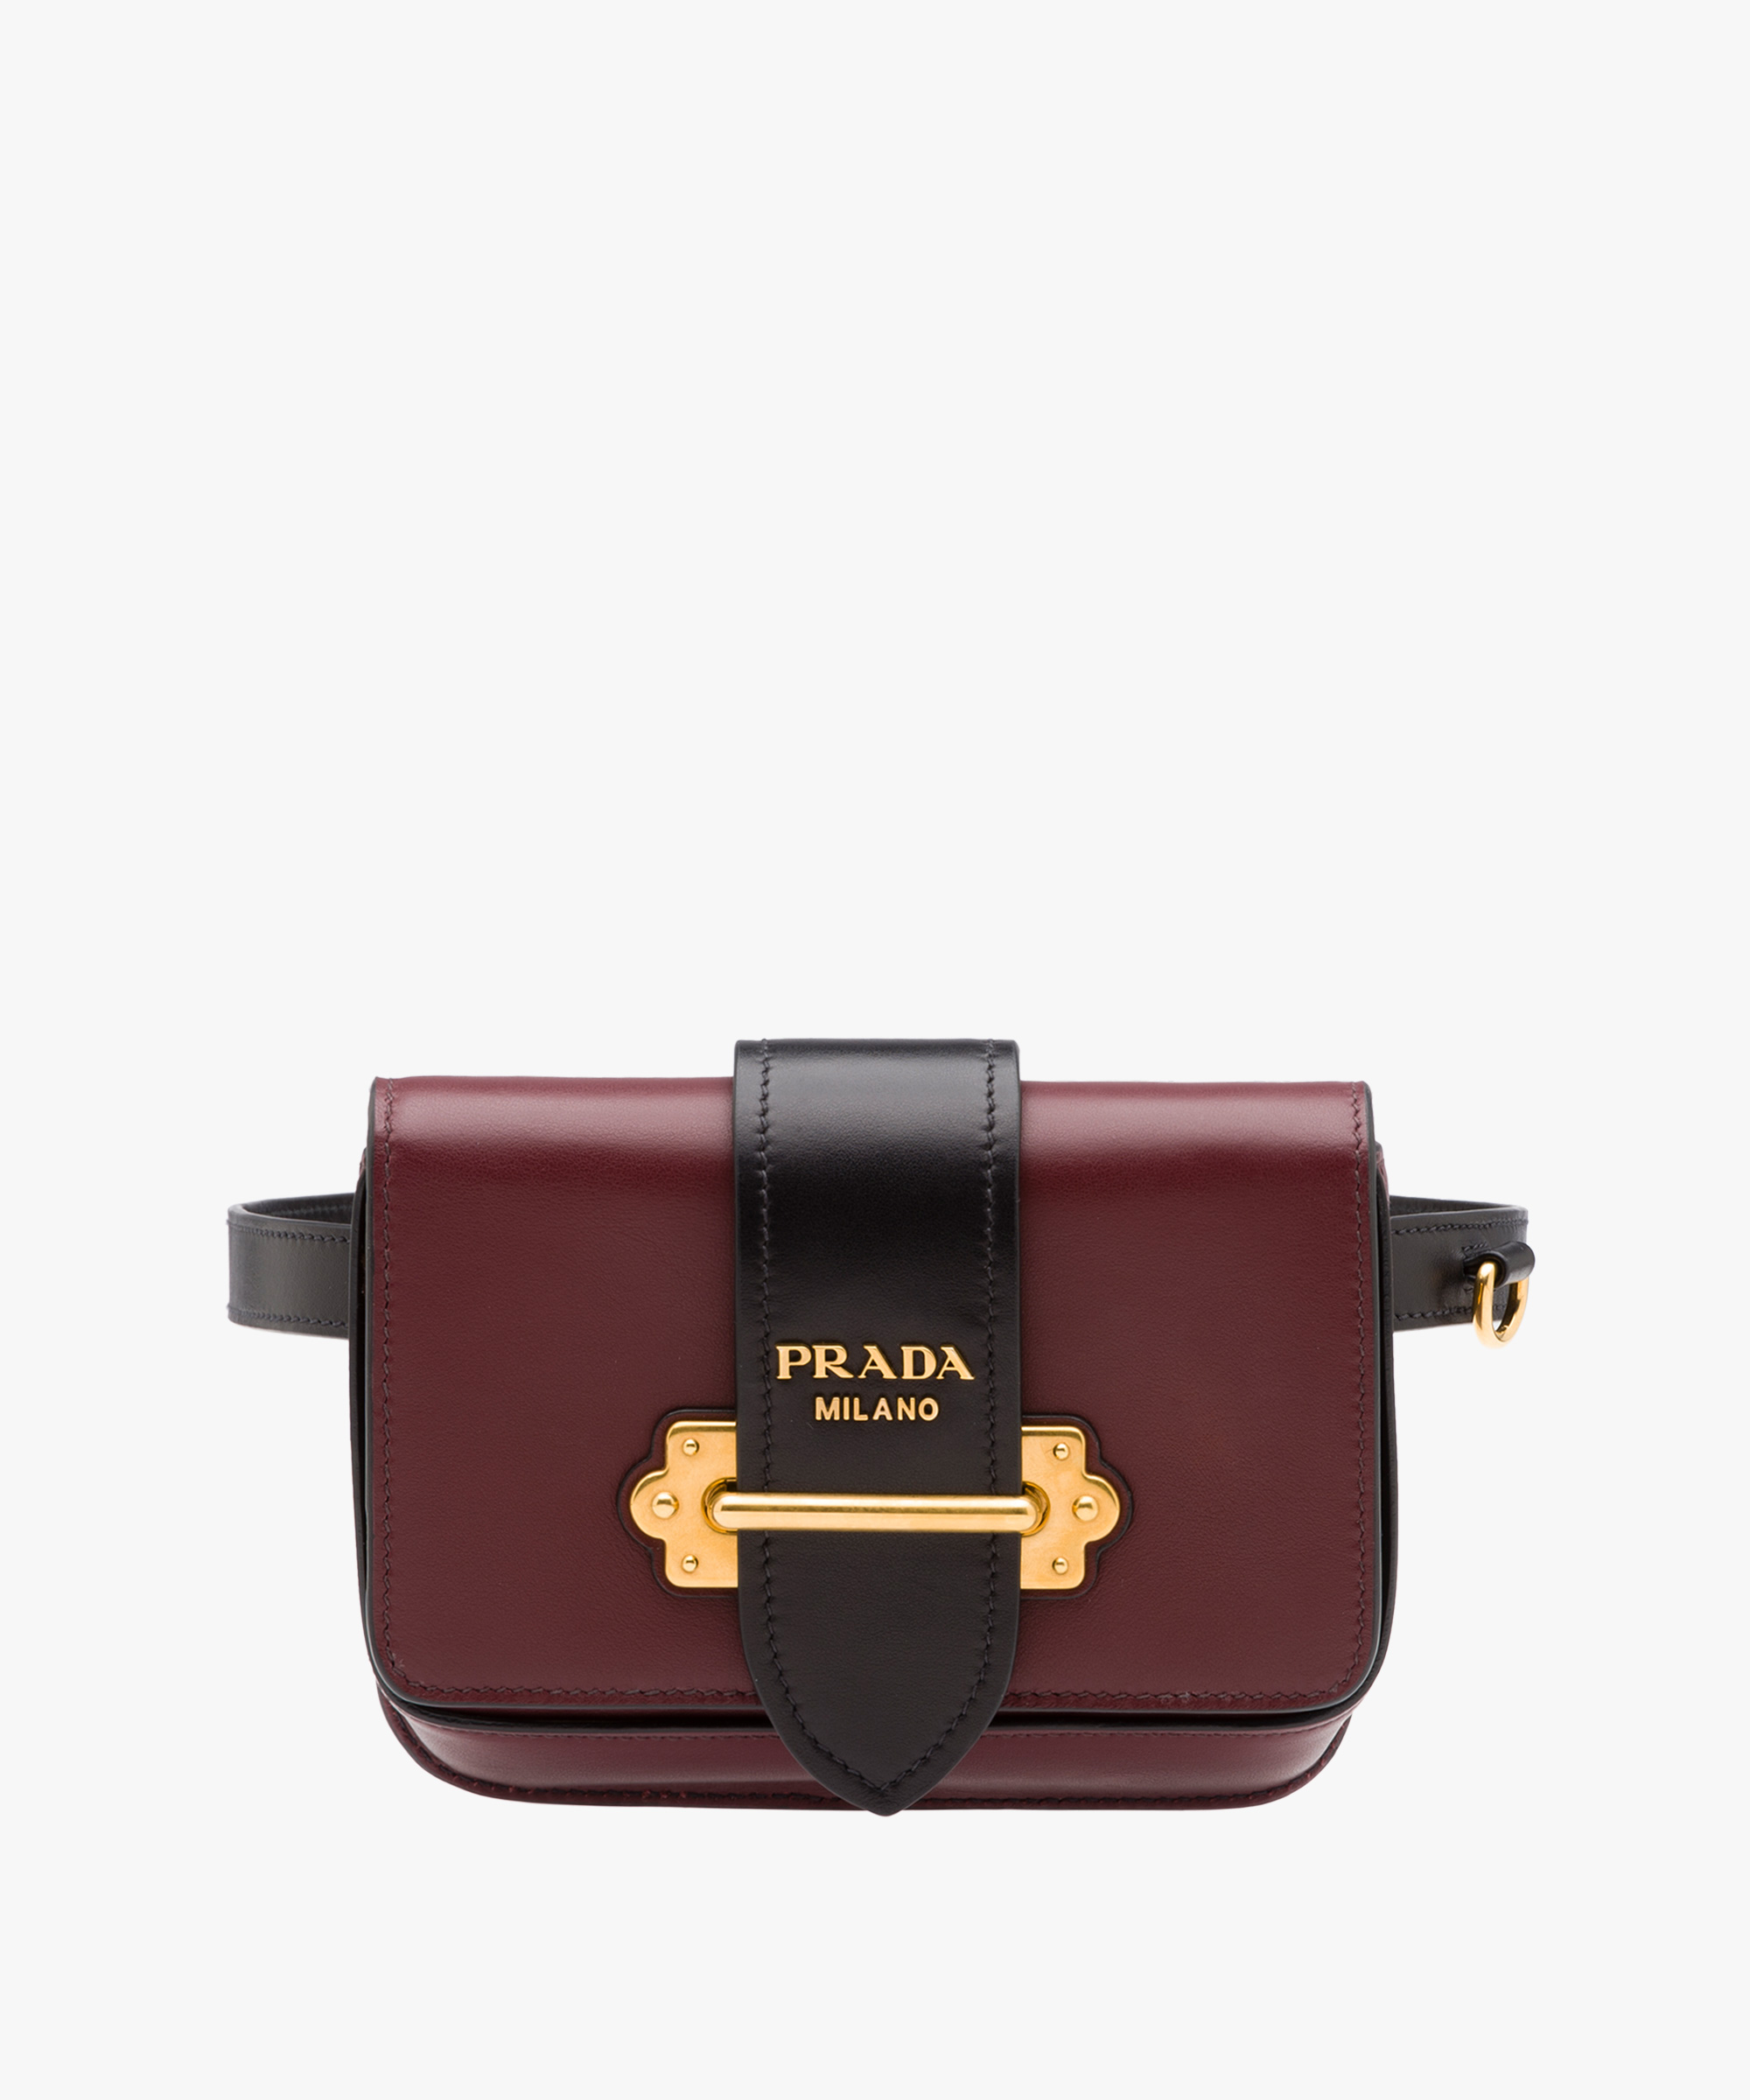 8888d1bbb41389 ... Prada Cahier Belt Bag Prada GARNET RED/BLACK ...